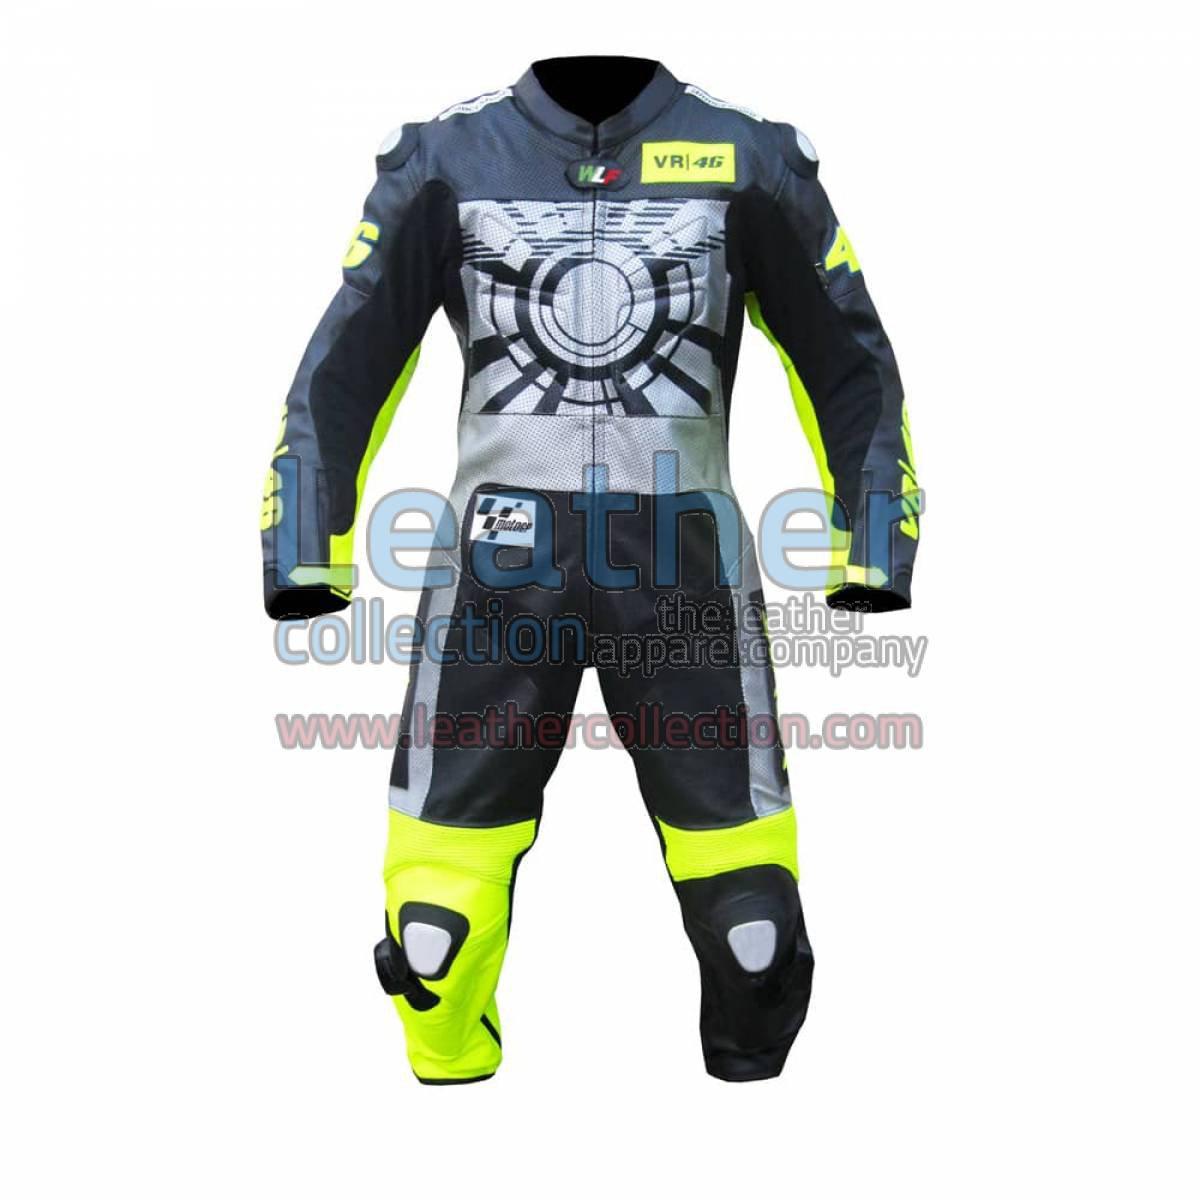 Valentino Rossi 2013 VR46 Race Suit